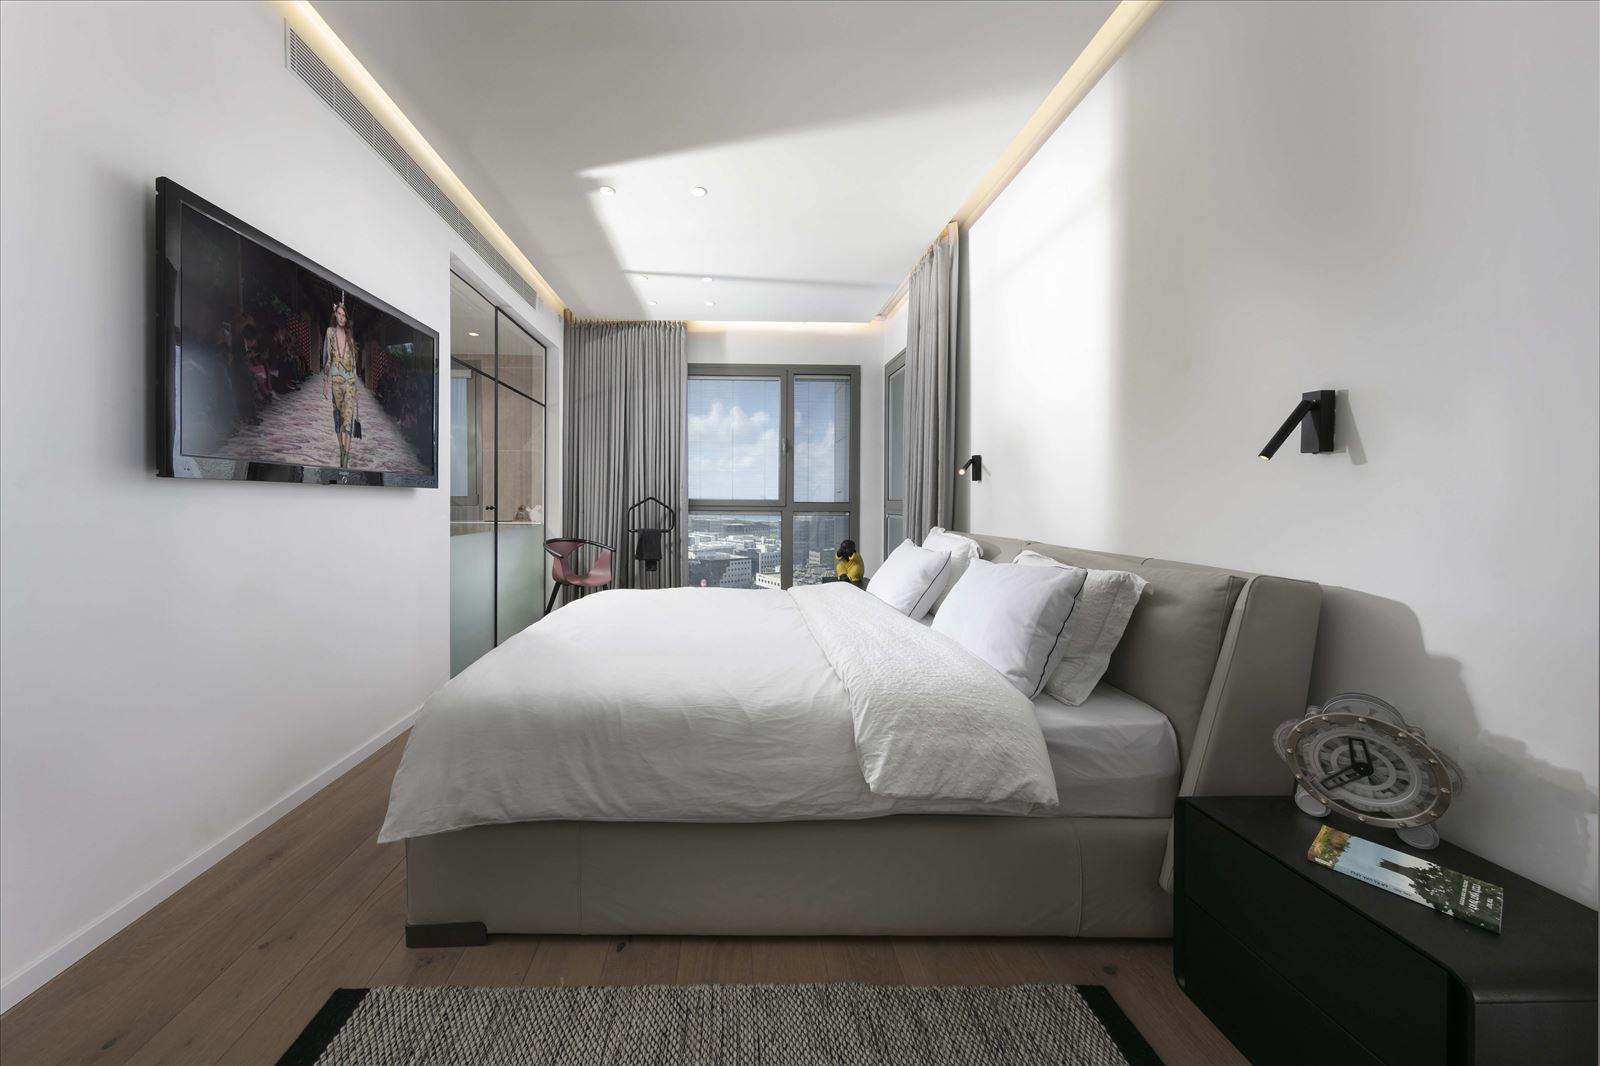 Private home - Herzliya גופי תאורה בחדר שינה מבית קמחי תאורה